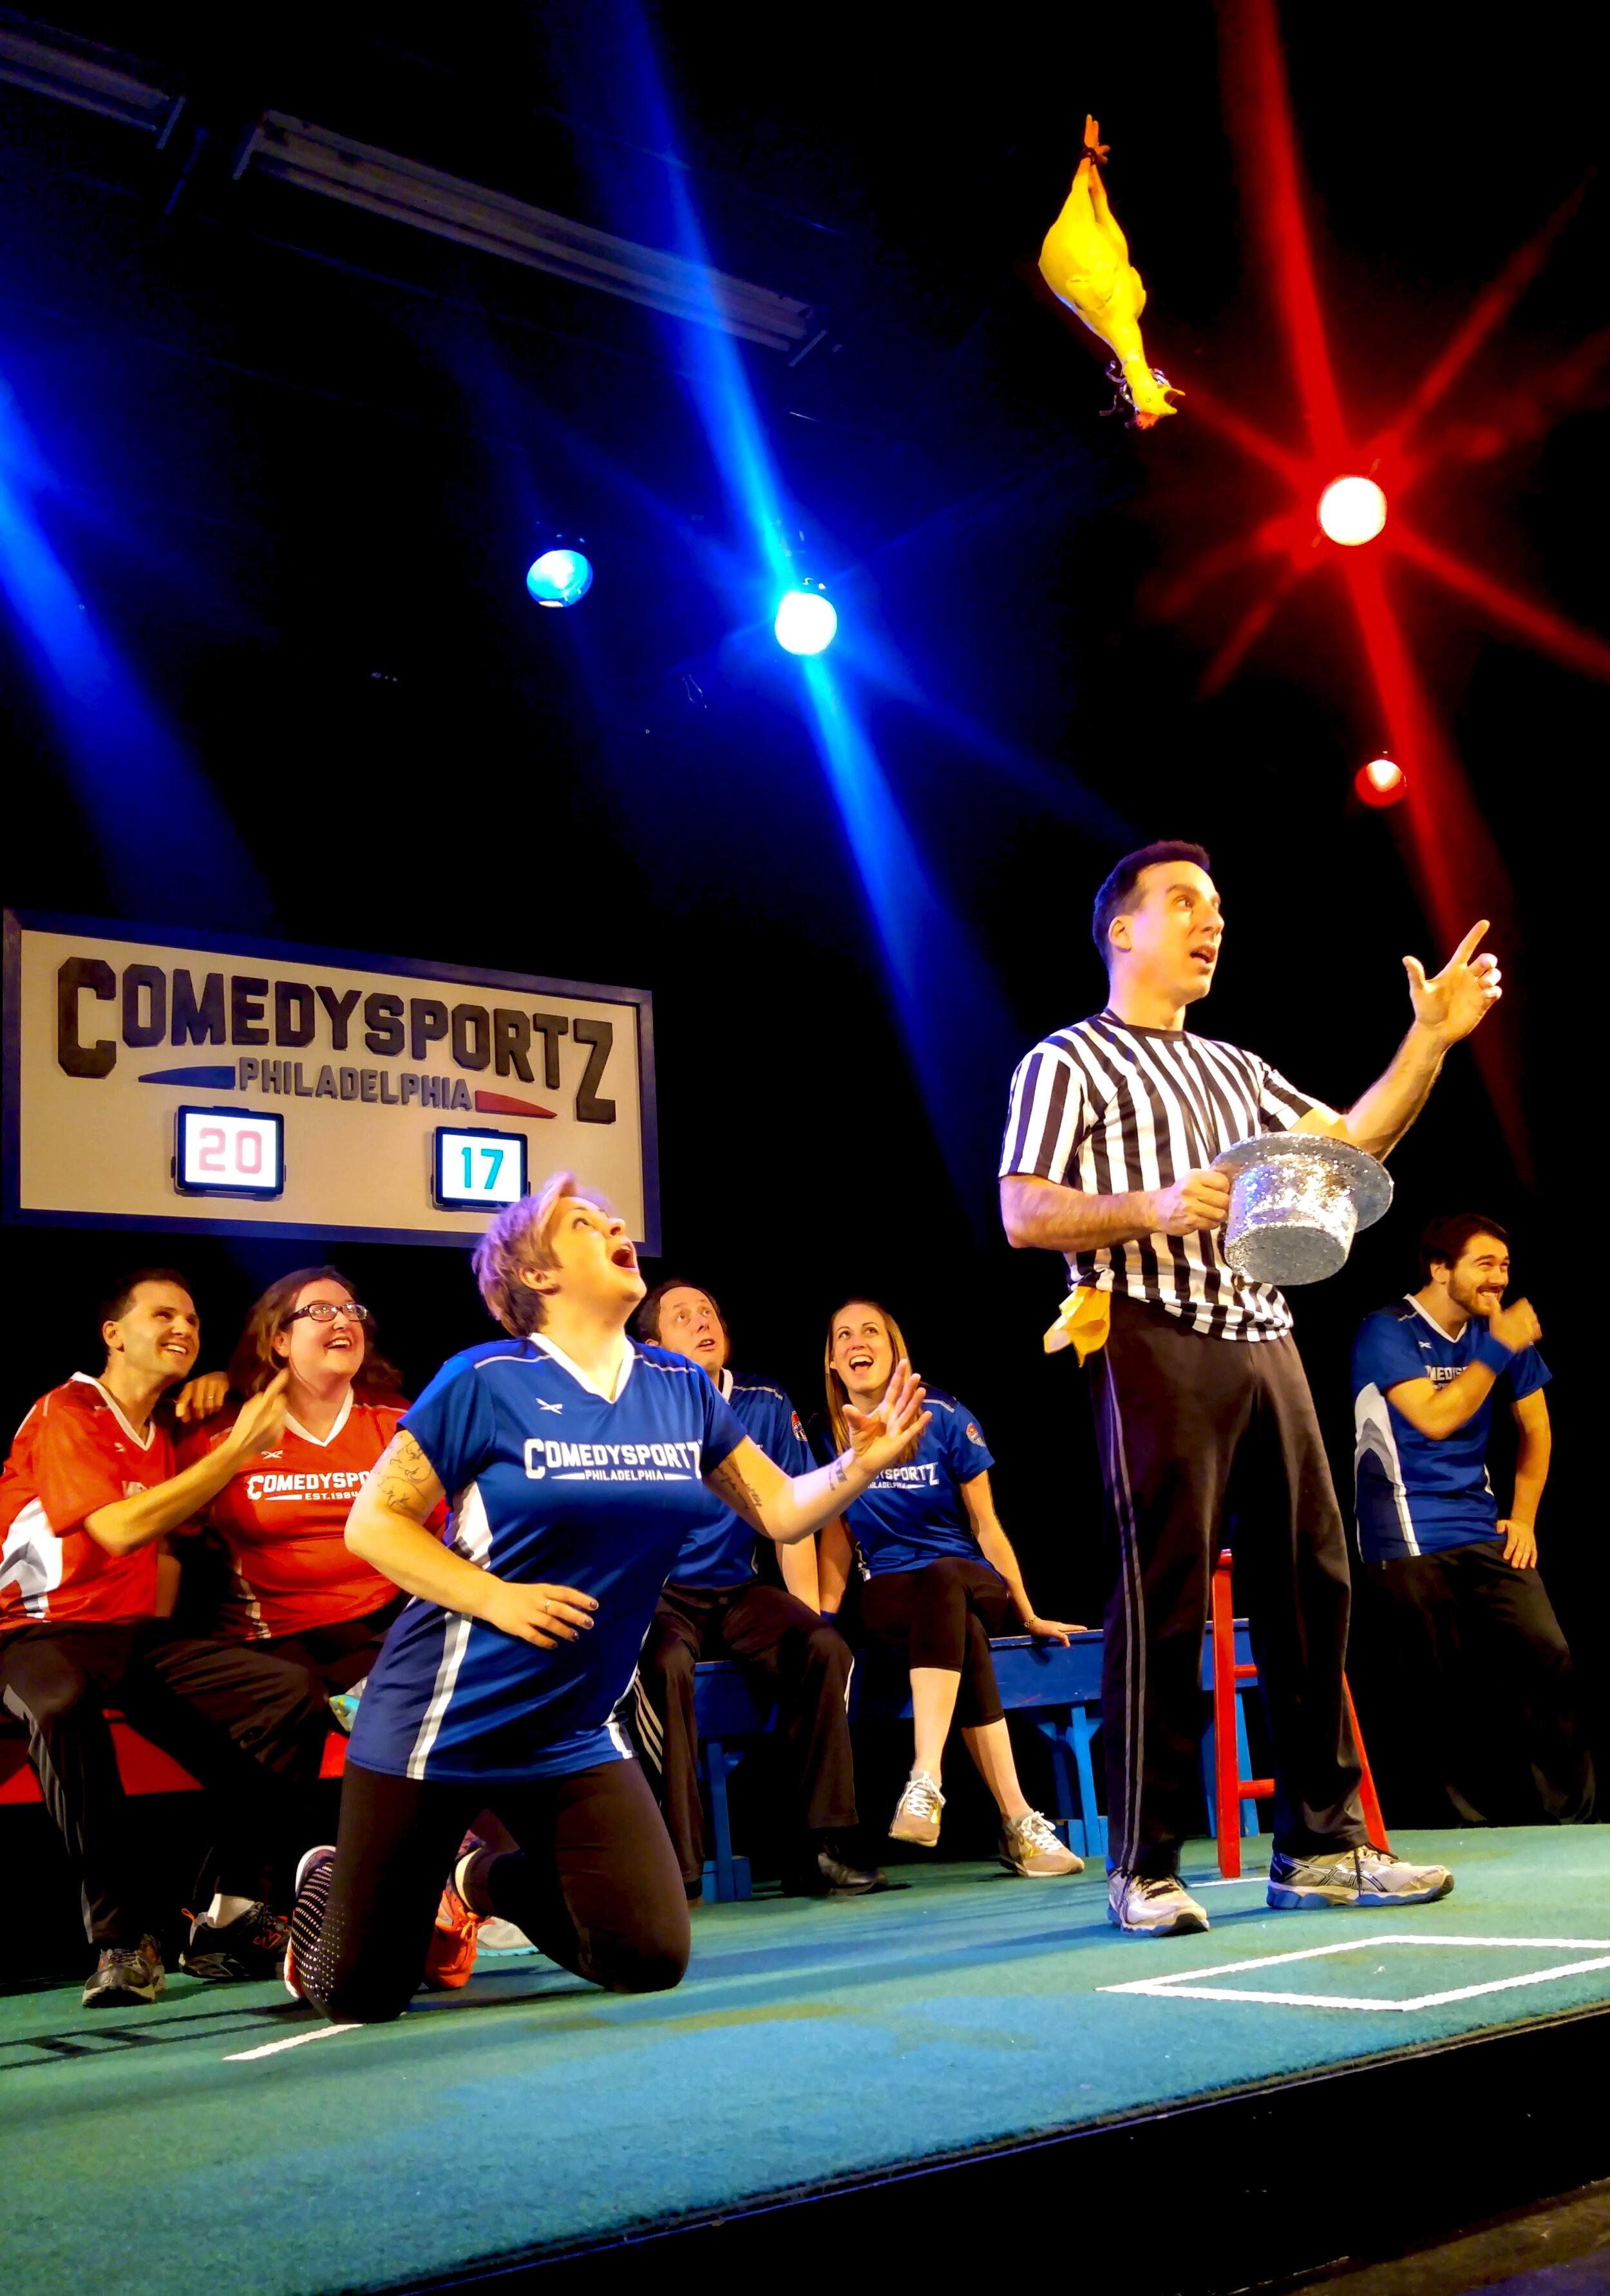 ComedySportz New Year's Improvin' Eve -